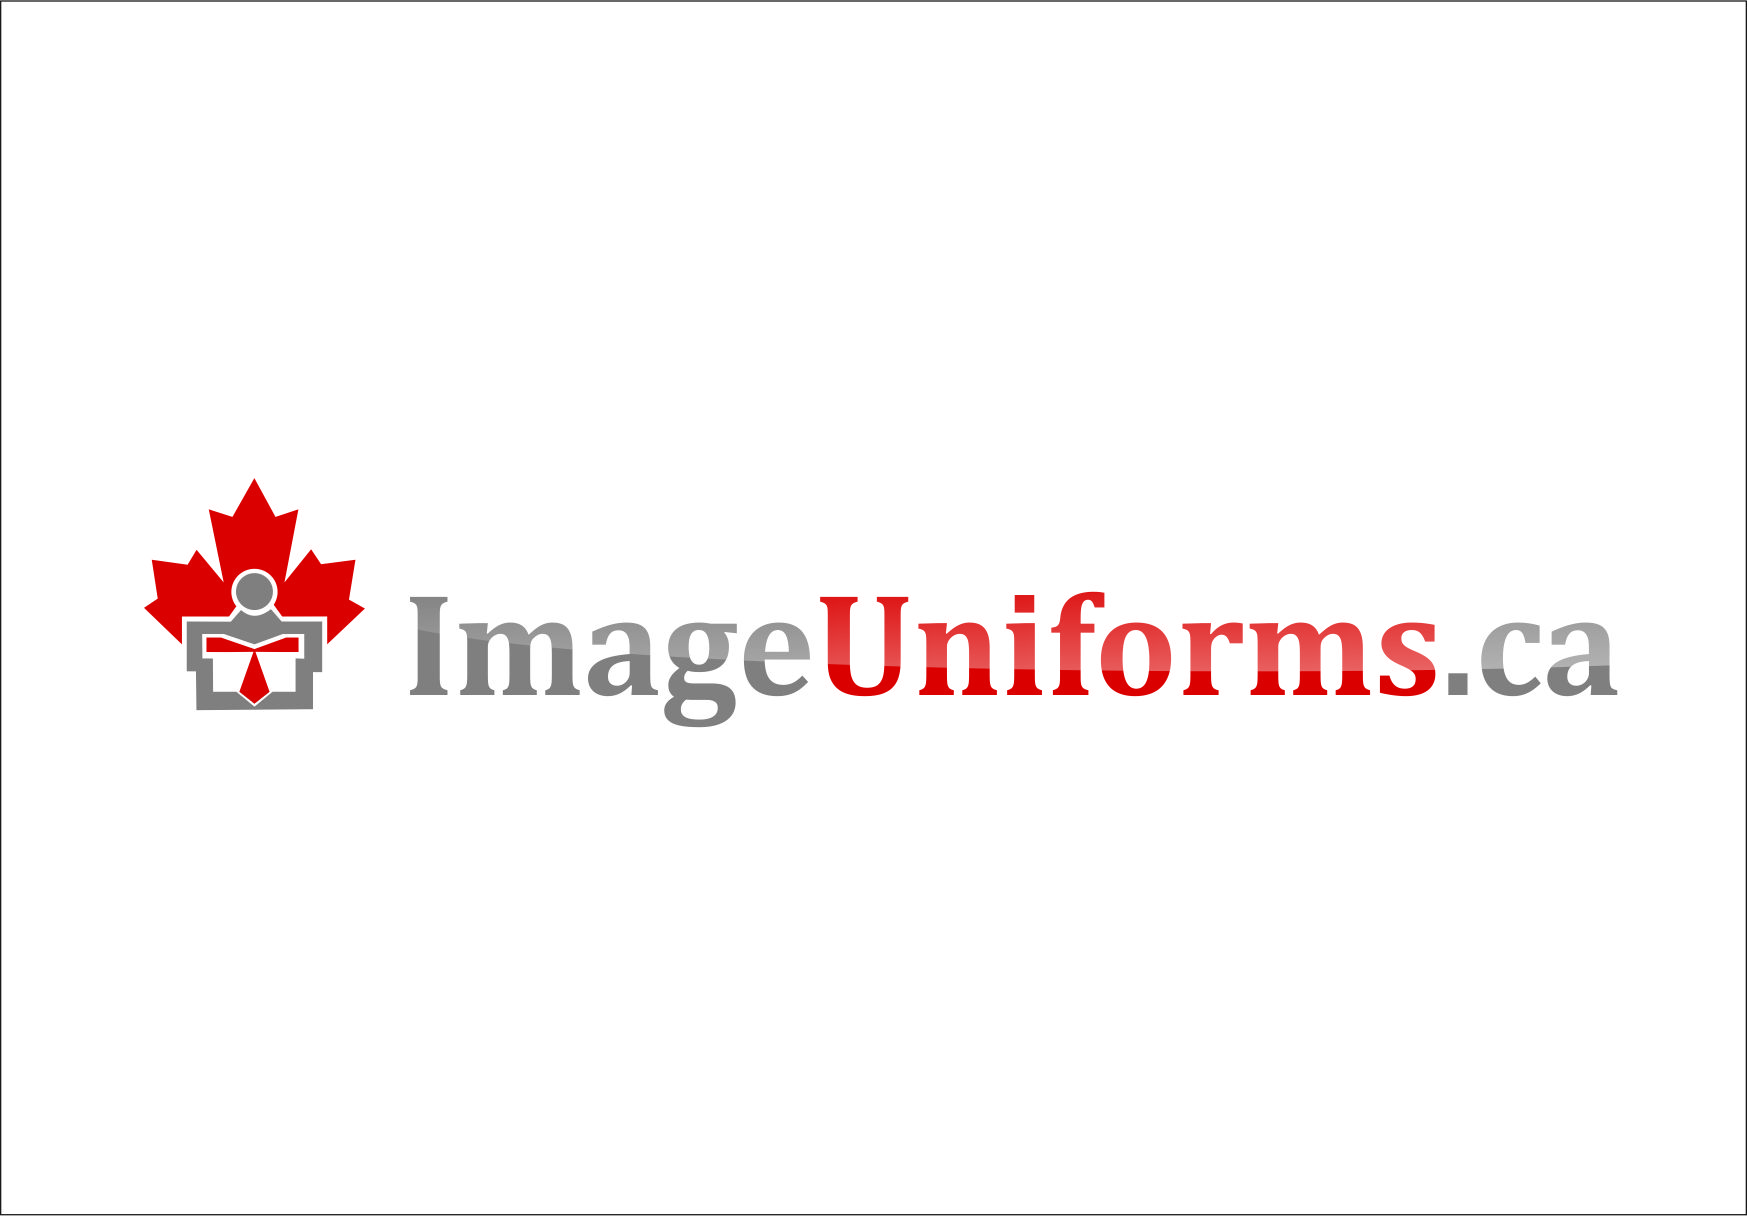 Logo Design by Agus Martoyo - Entry No. 56 in the Logo Design Contest Inspiring Logo Design for Image Uniforms Inc.